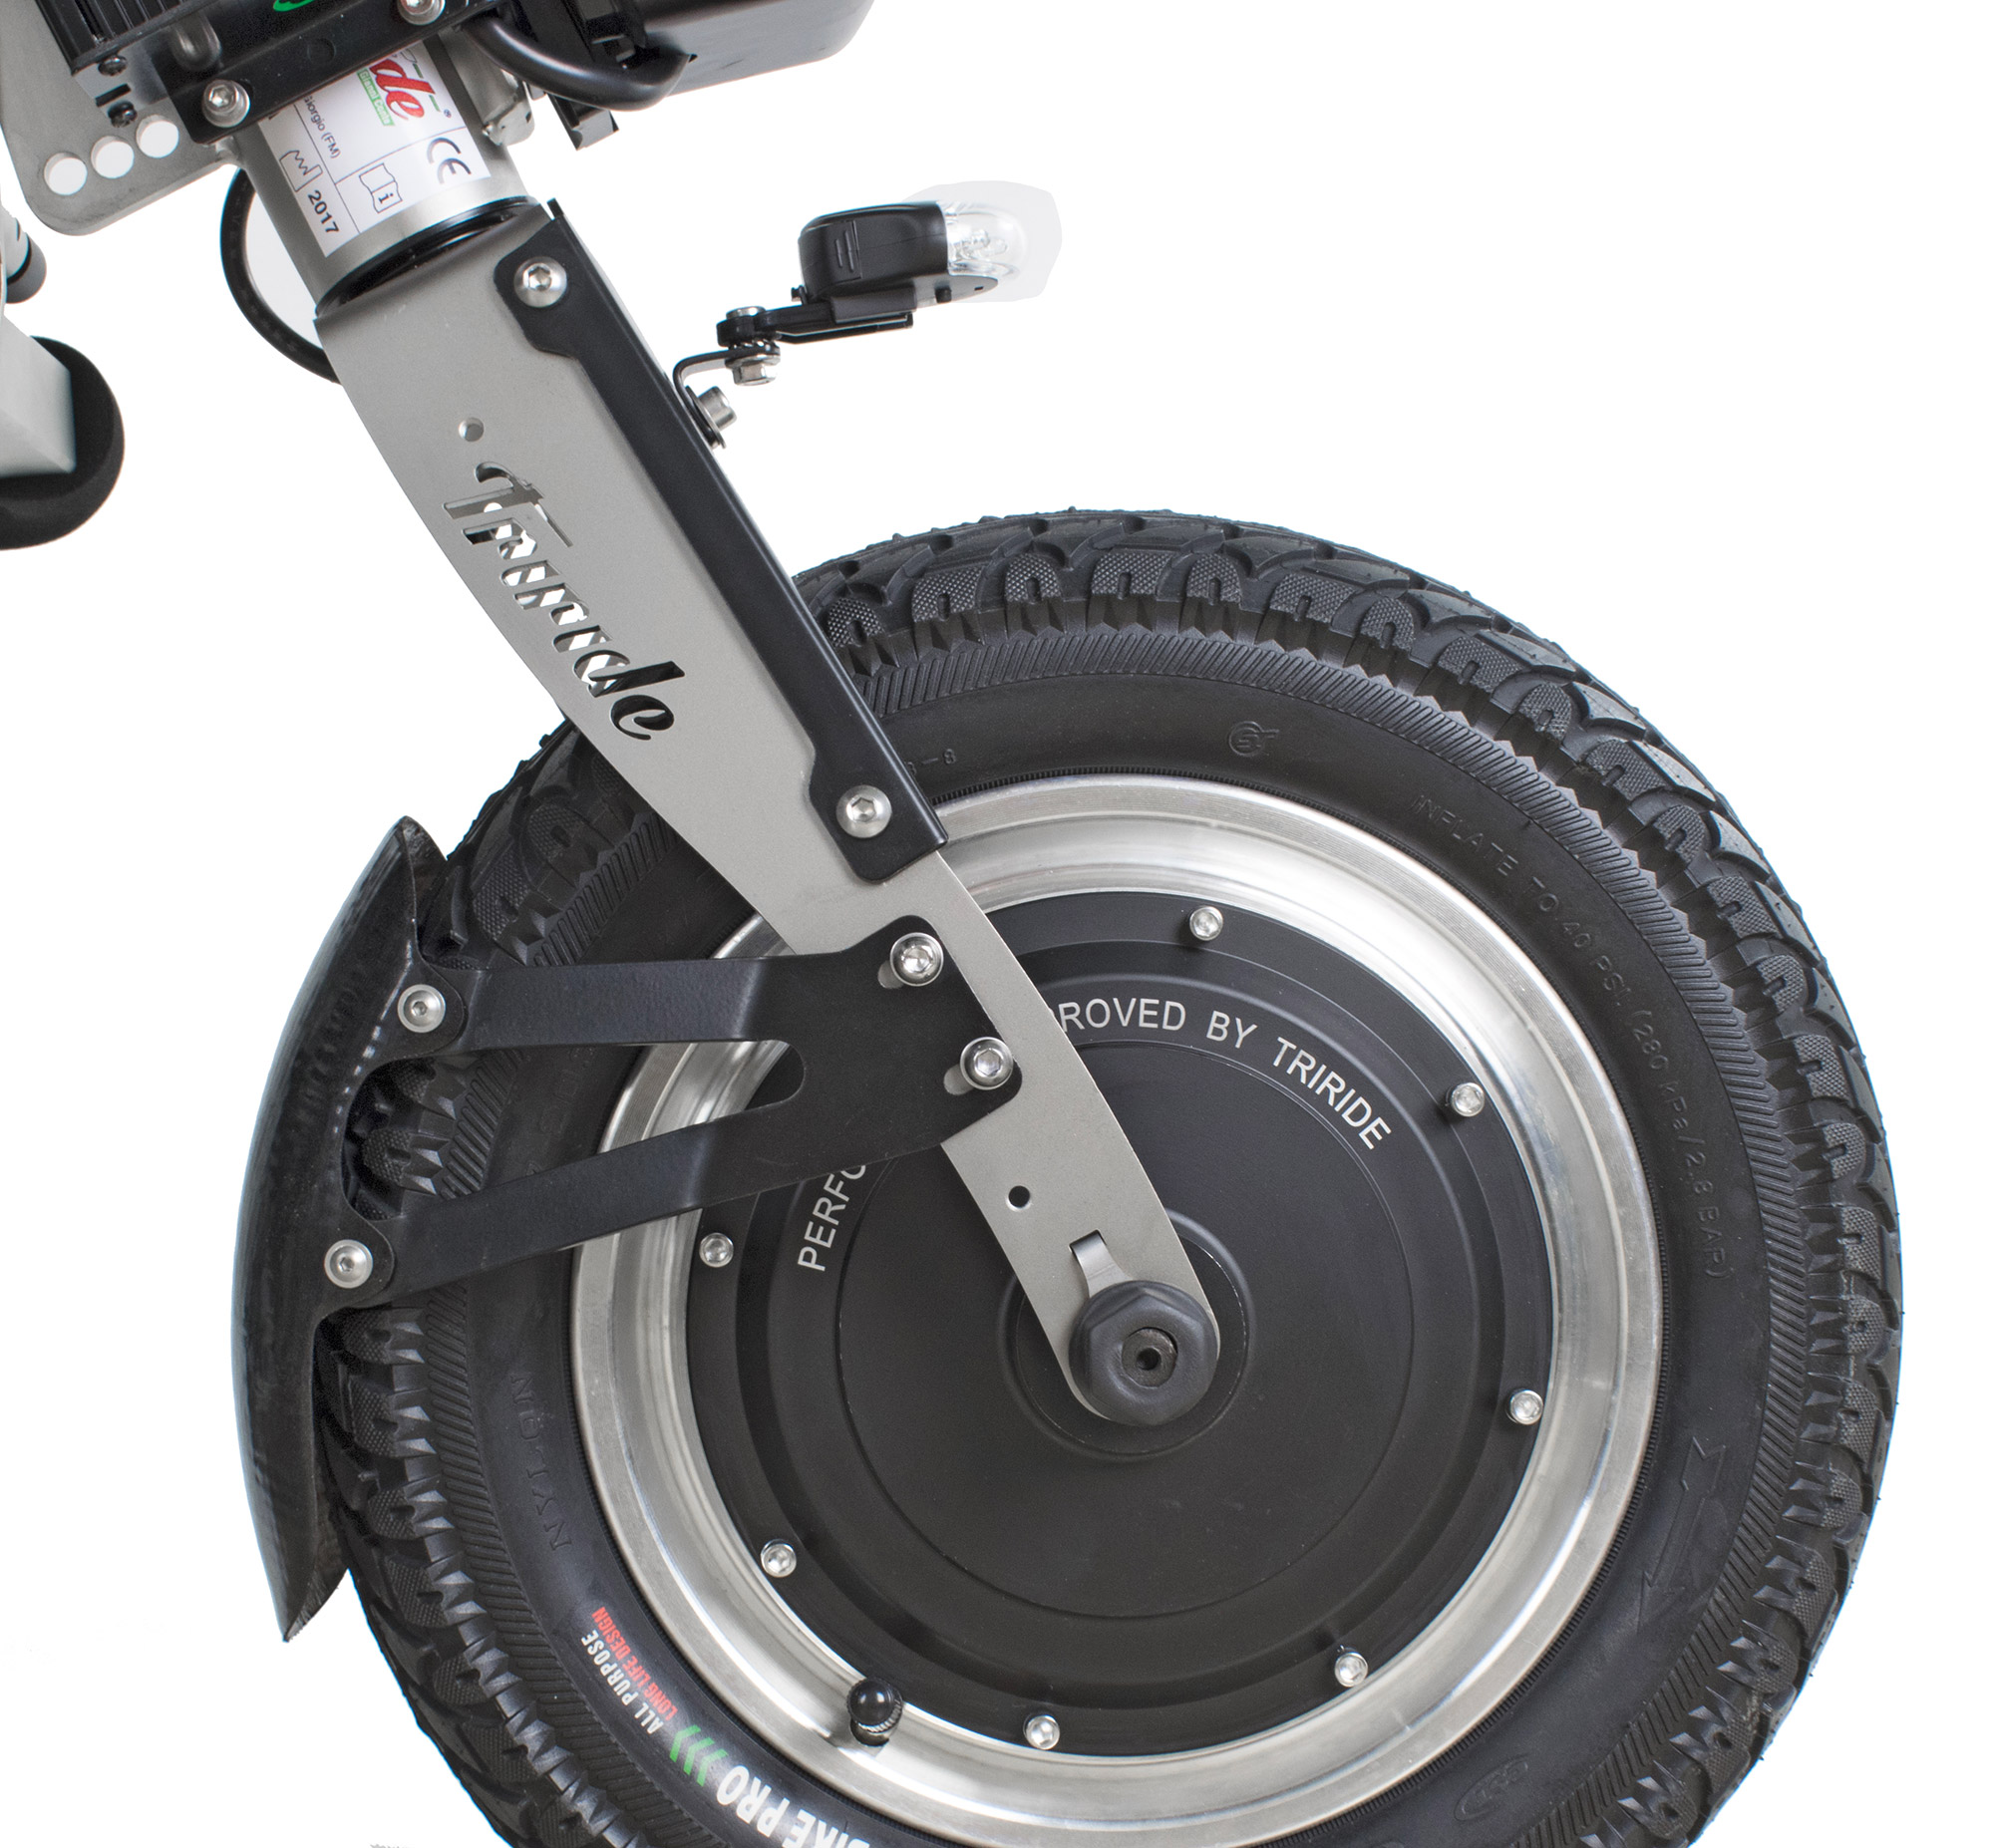 triride-special-compact-lato-motore.jpg